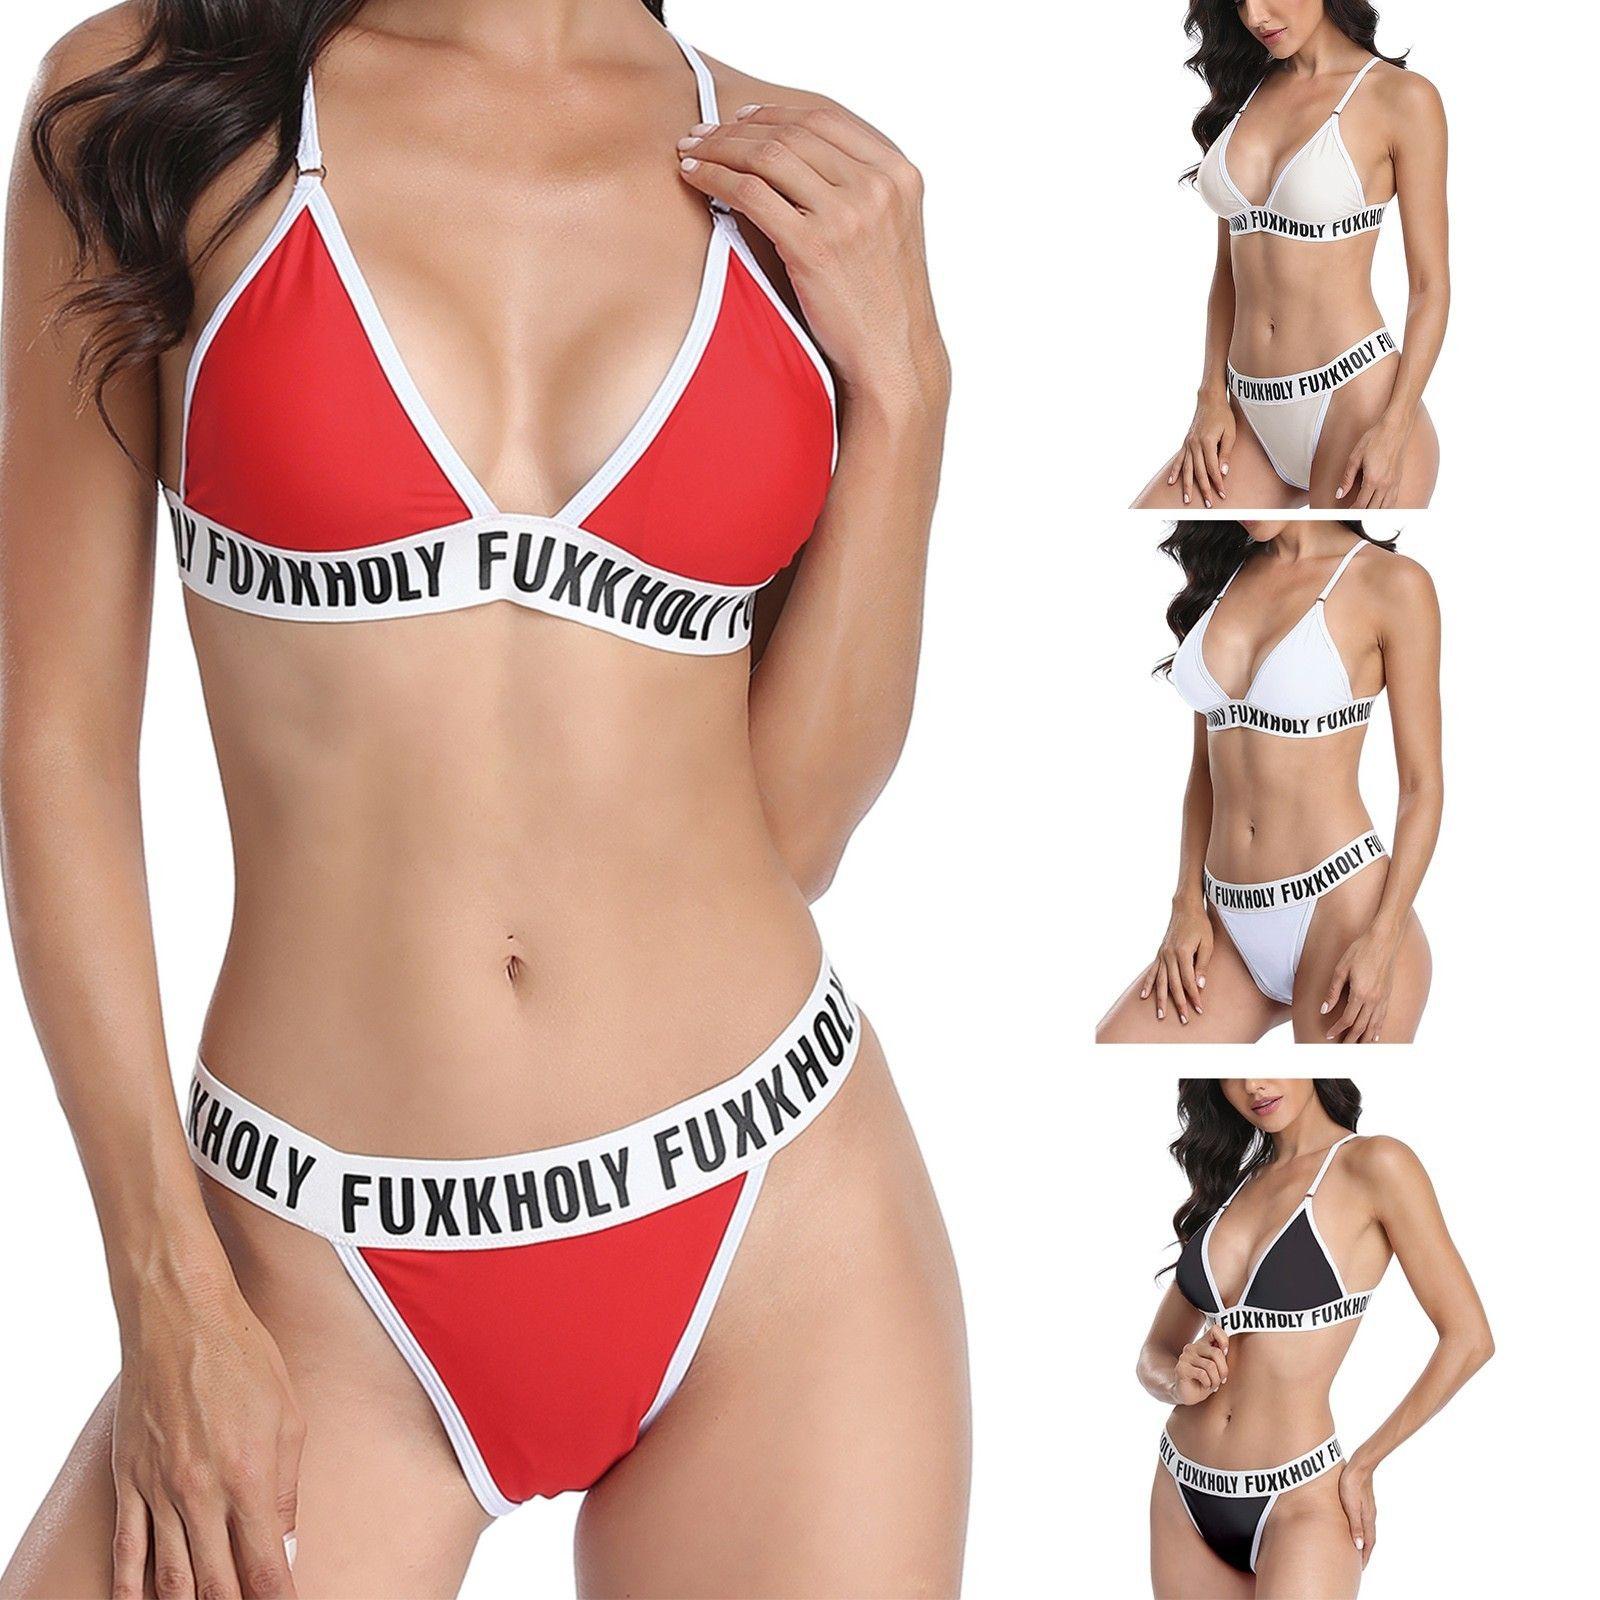 Women'sSuspender 오픈 백 스플릿 바디 수영복 여성의 섹시한 패션 슬링 편지 Fukkholy Split Swimsuit Bikini Suit 2021